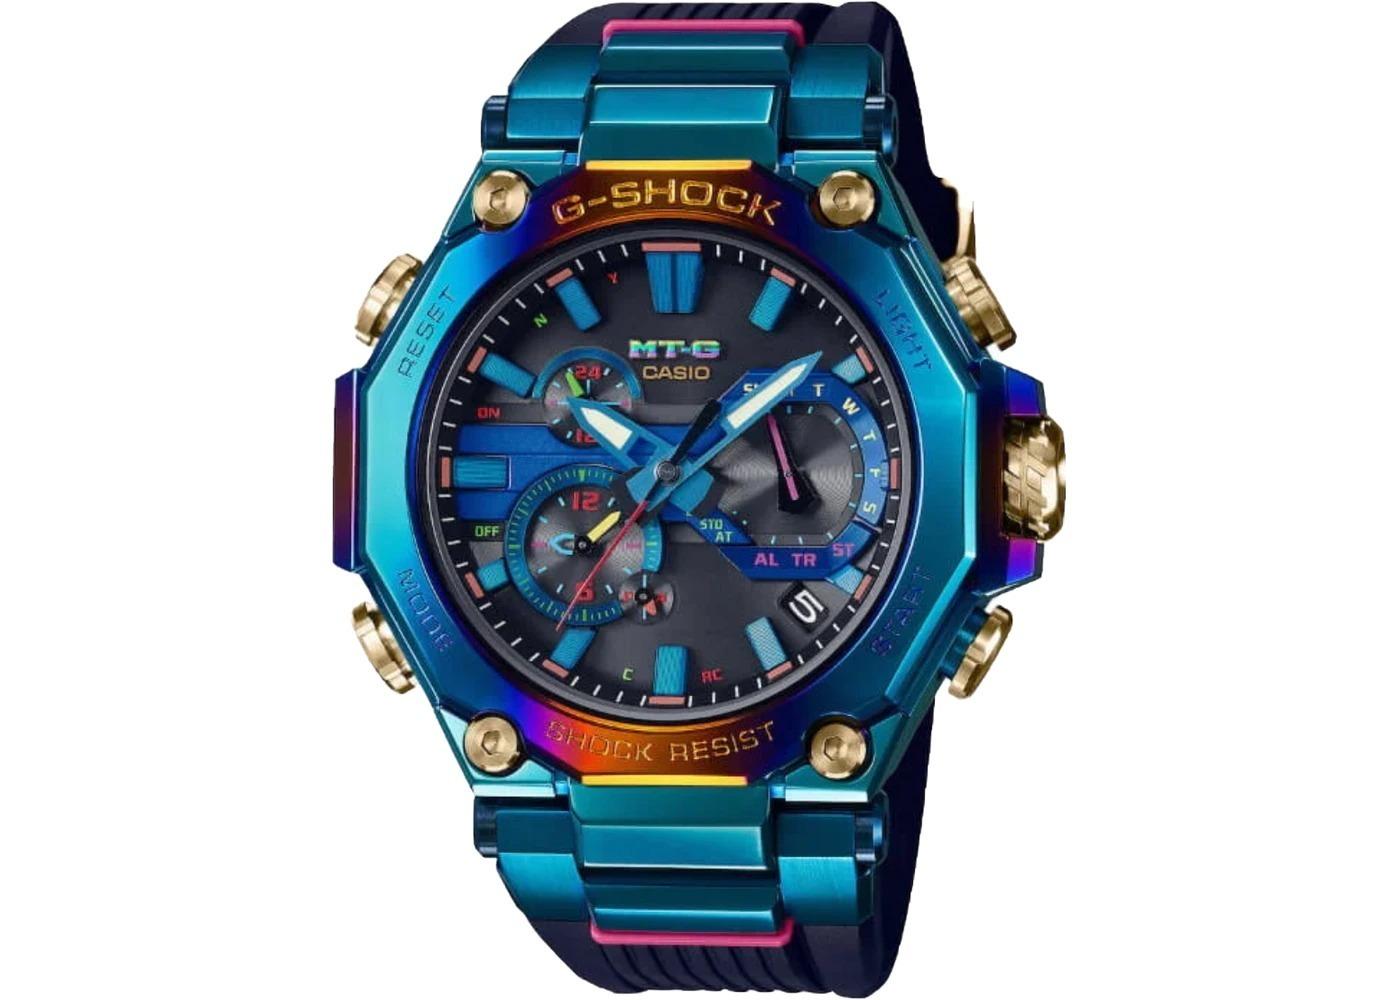 Casio G-Shock Blue Phoenix MTG-B2000PH-2A - 52mm in Stainless Steel の写真